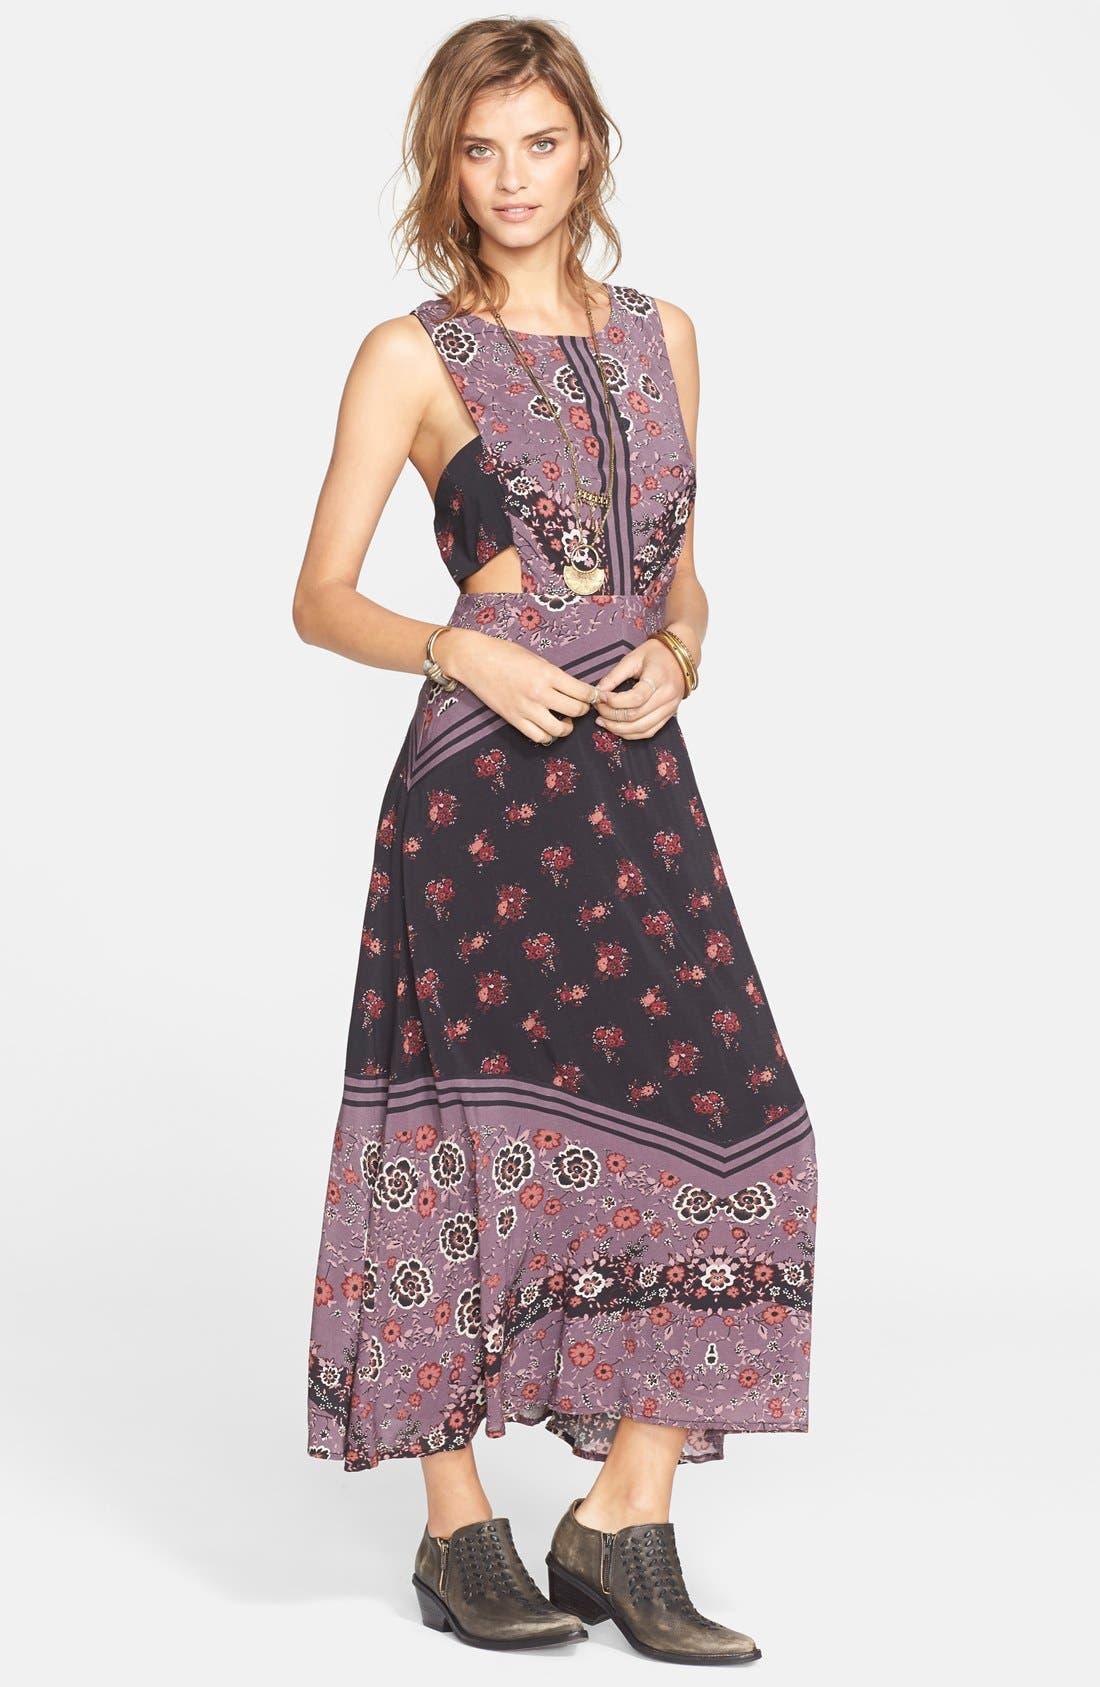 FREE PEOPLE,                             'Sunrise Oblivion' Floral Print Dress,                             Main thumbnail 1, color,                             001